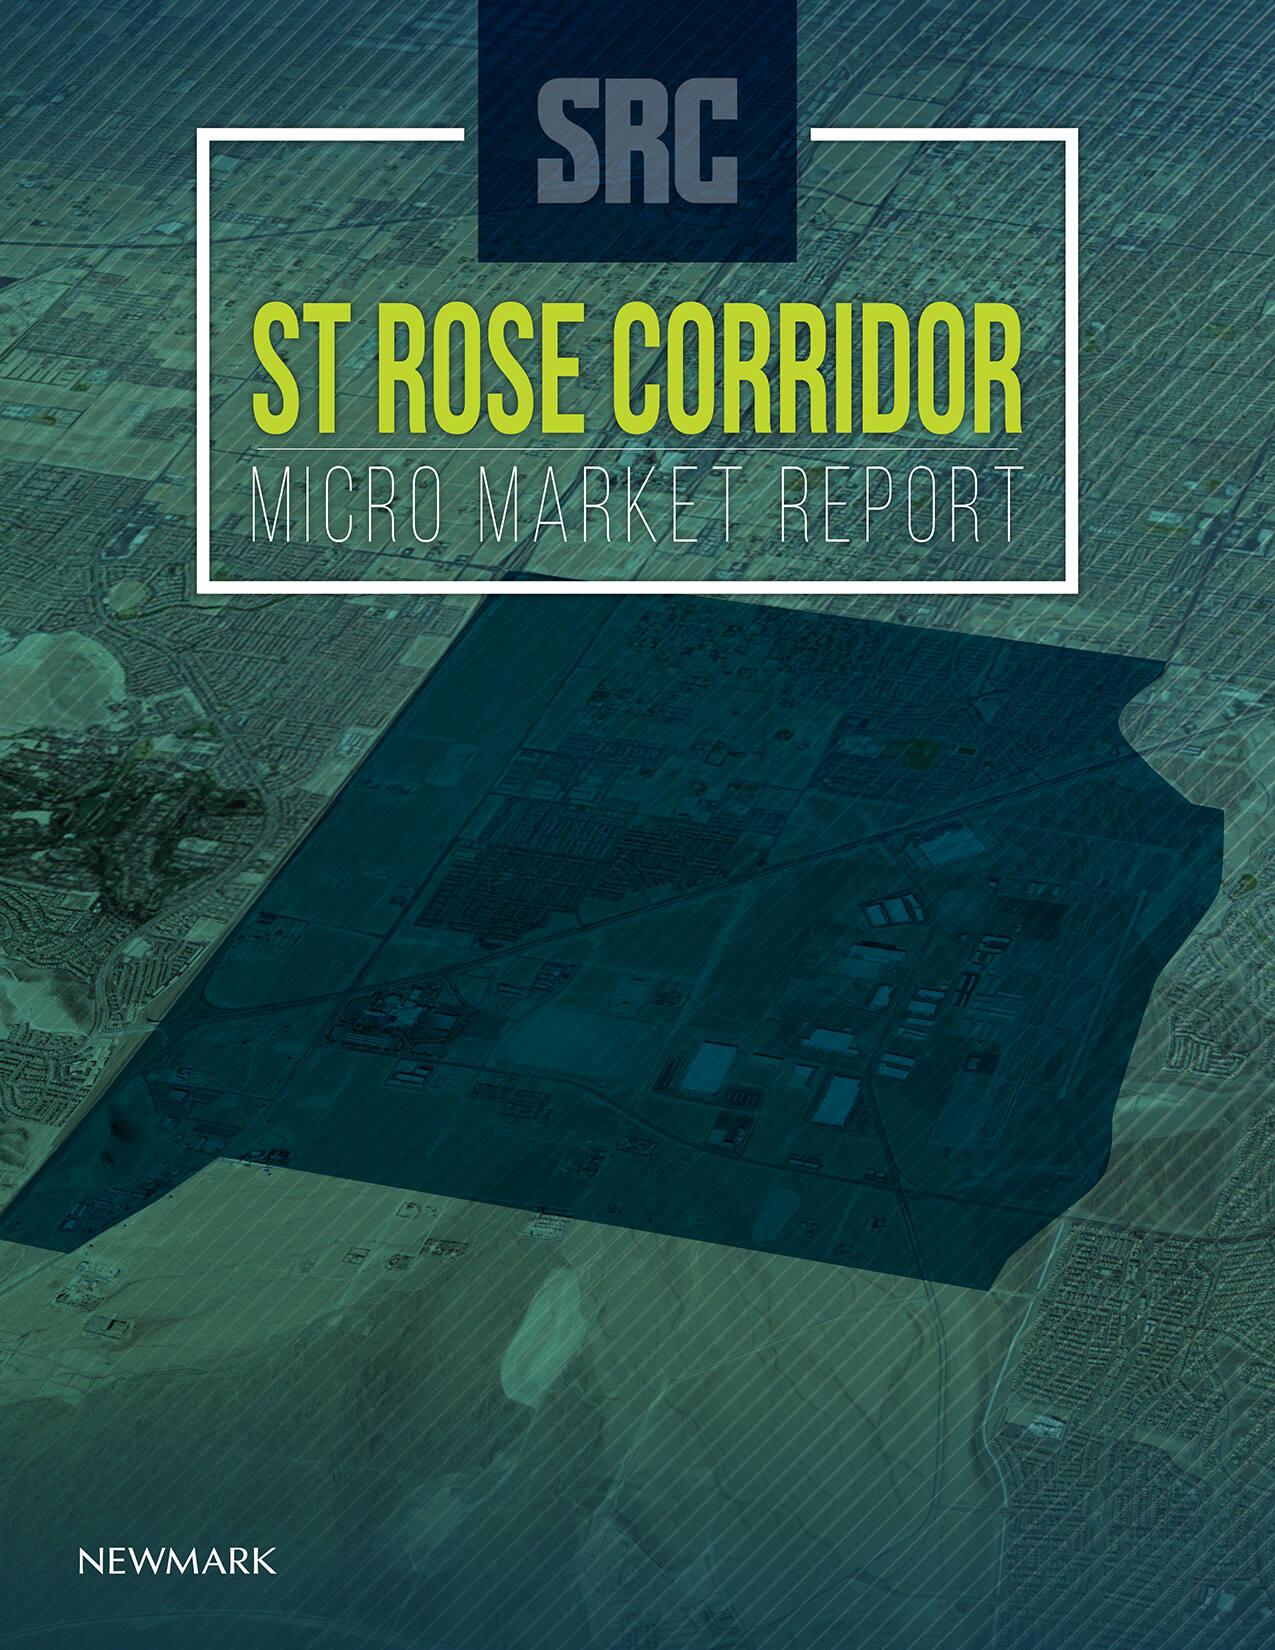 St. Rose Corridor - Henderson, Nevada Market Reports Report document image